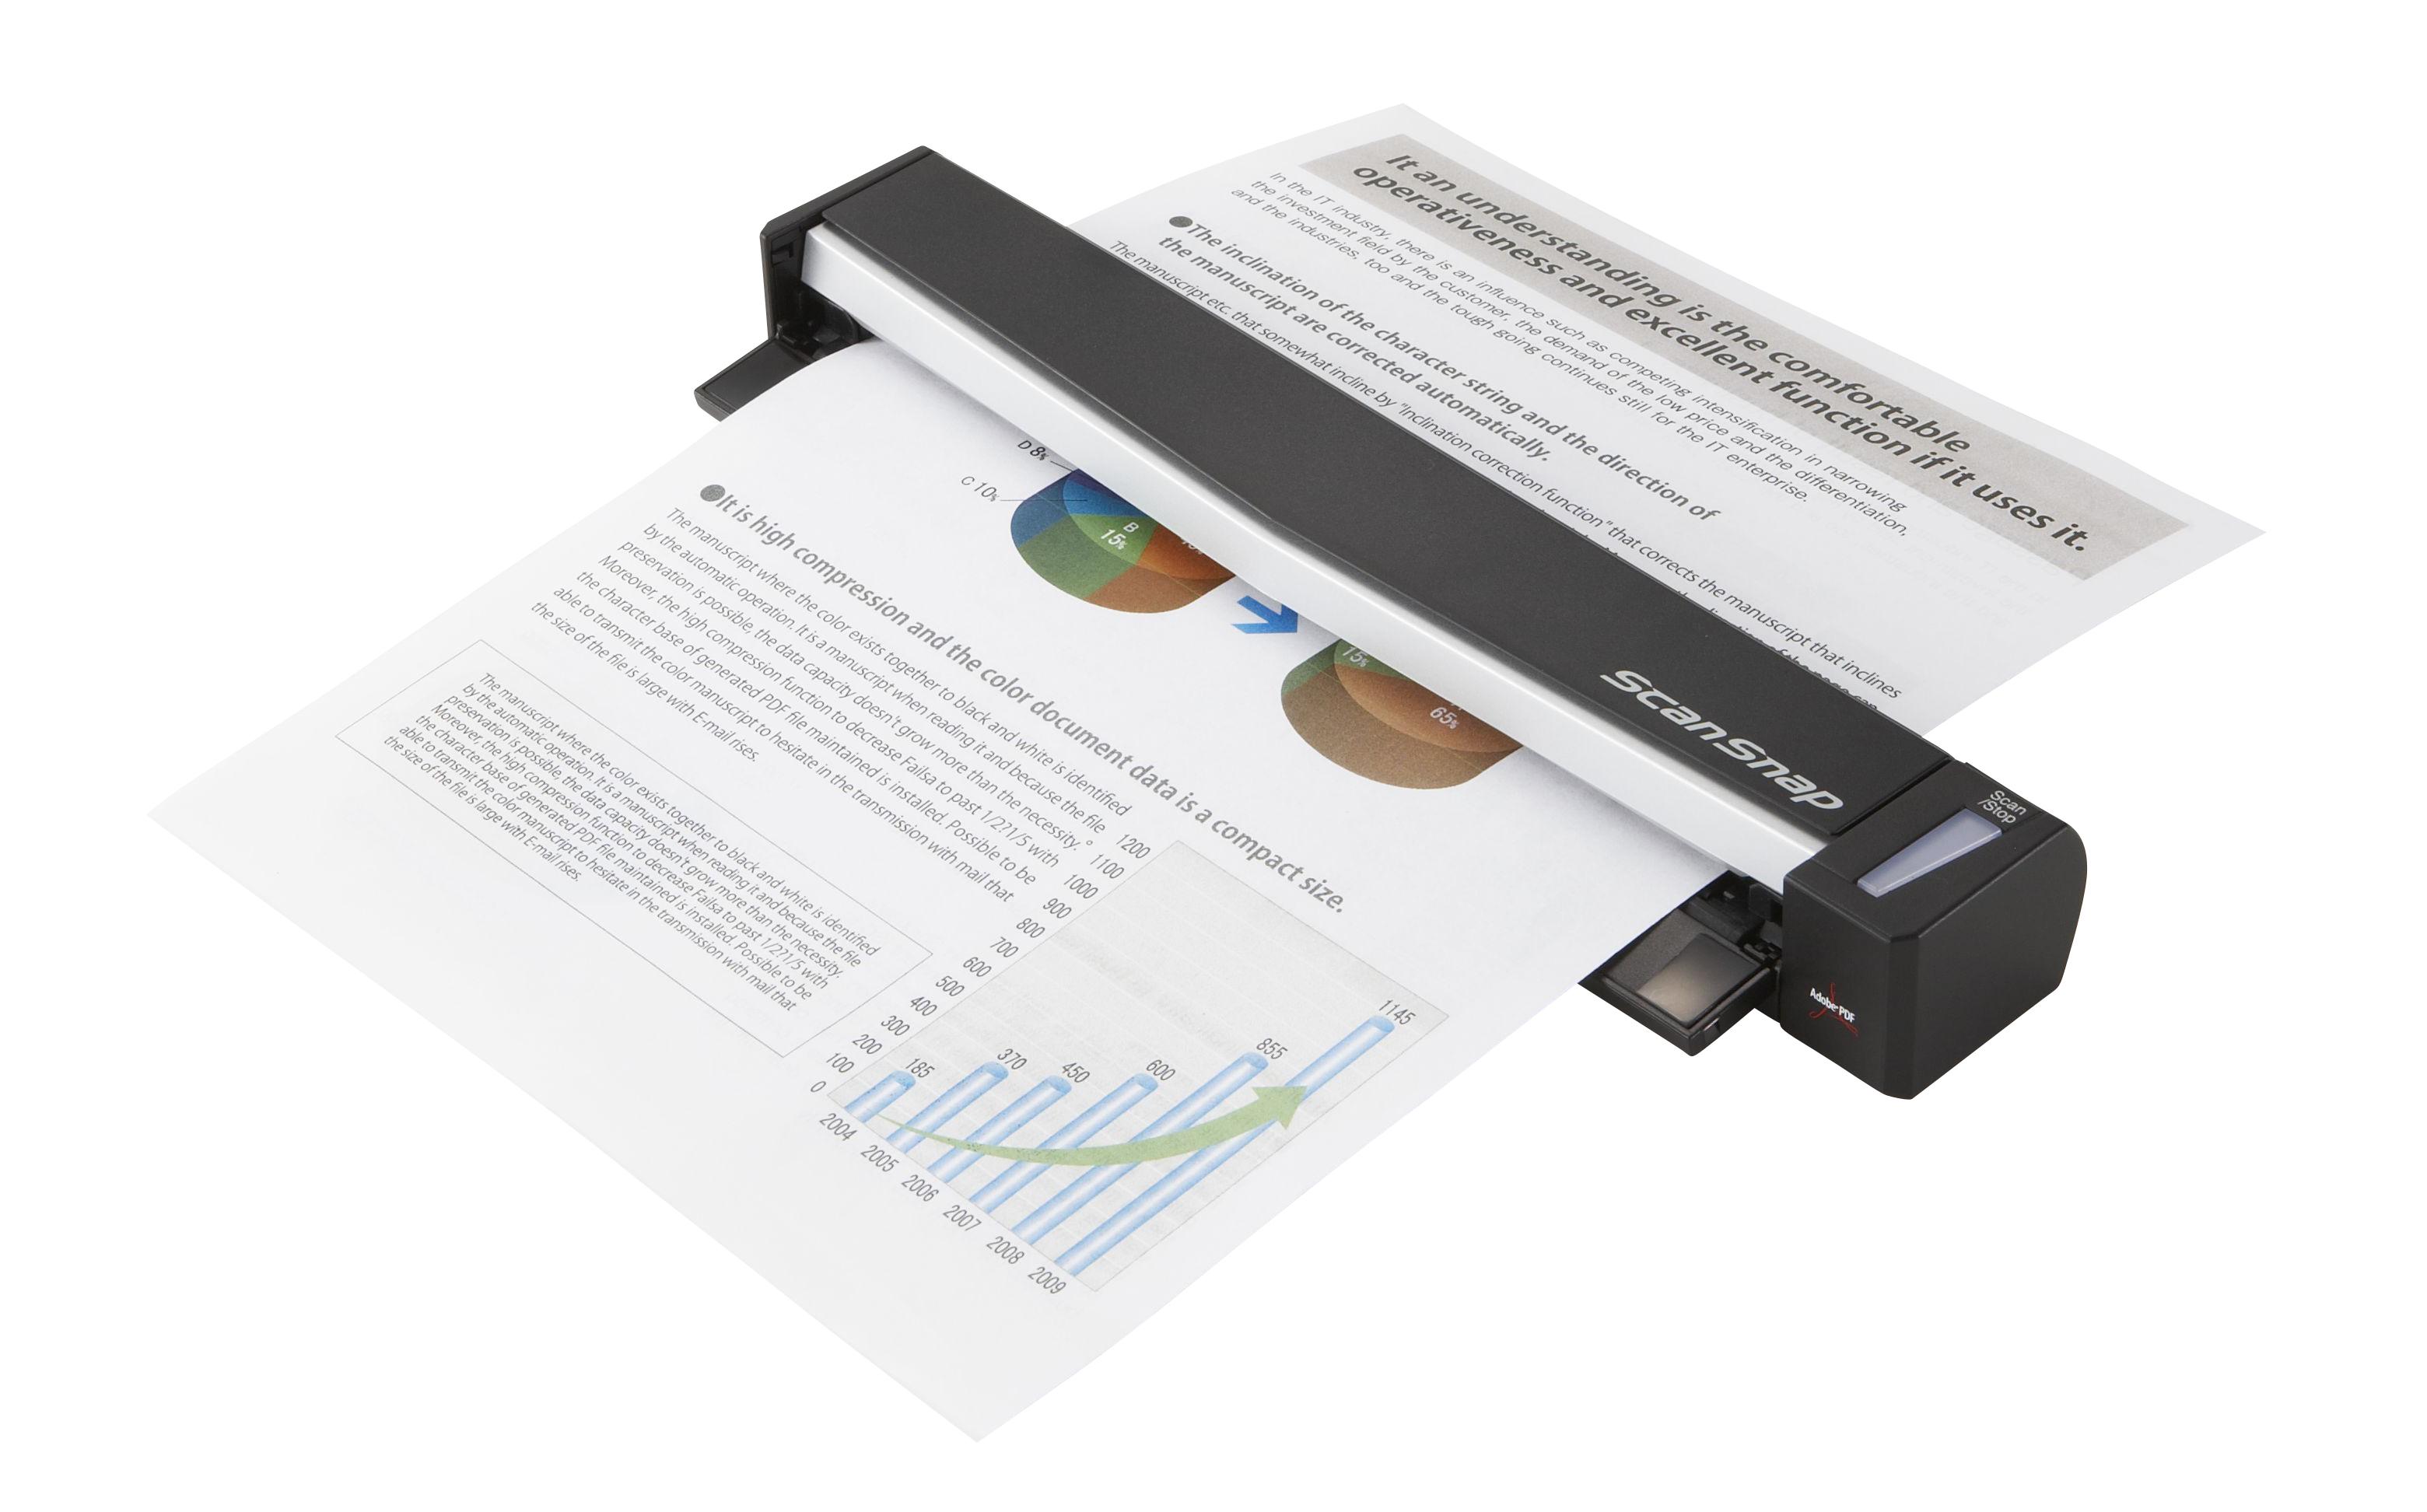 Fujitsu image scanner scansnap s1100 fujitsu global.